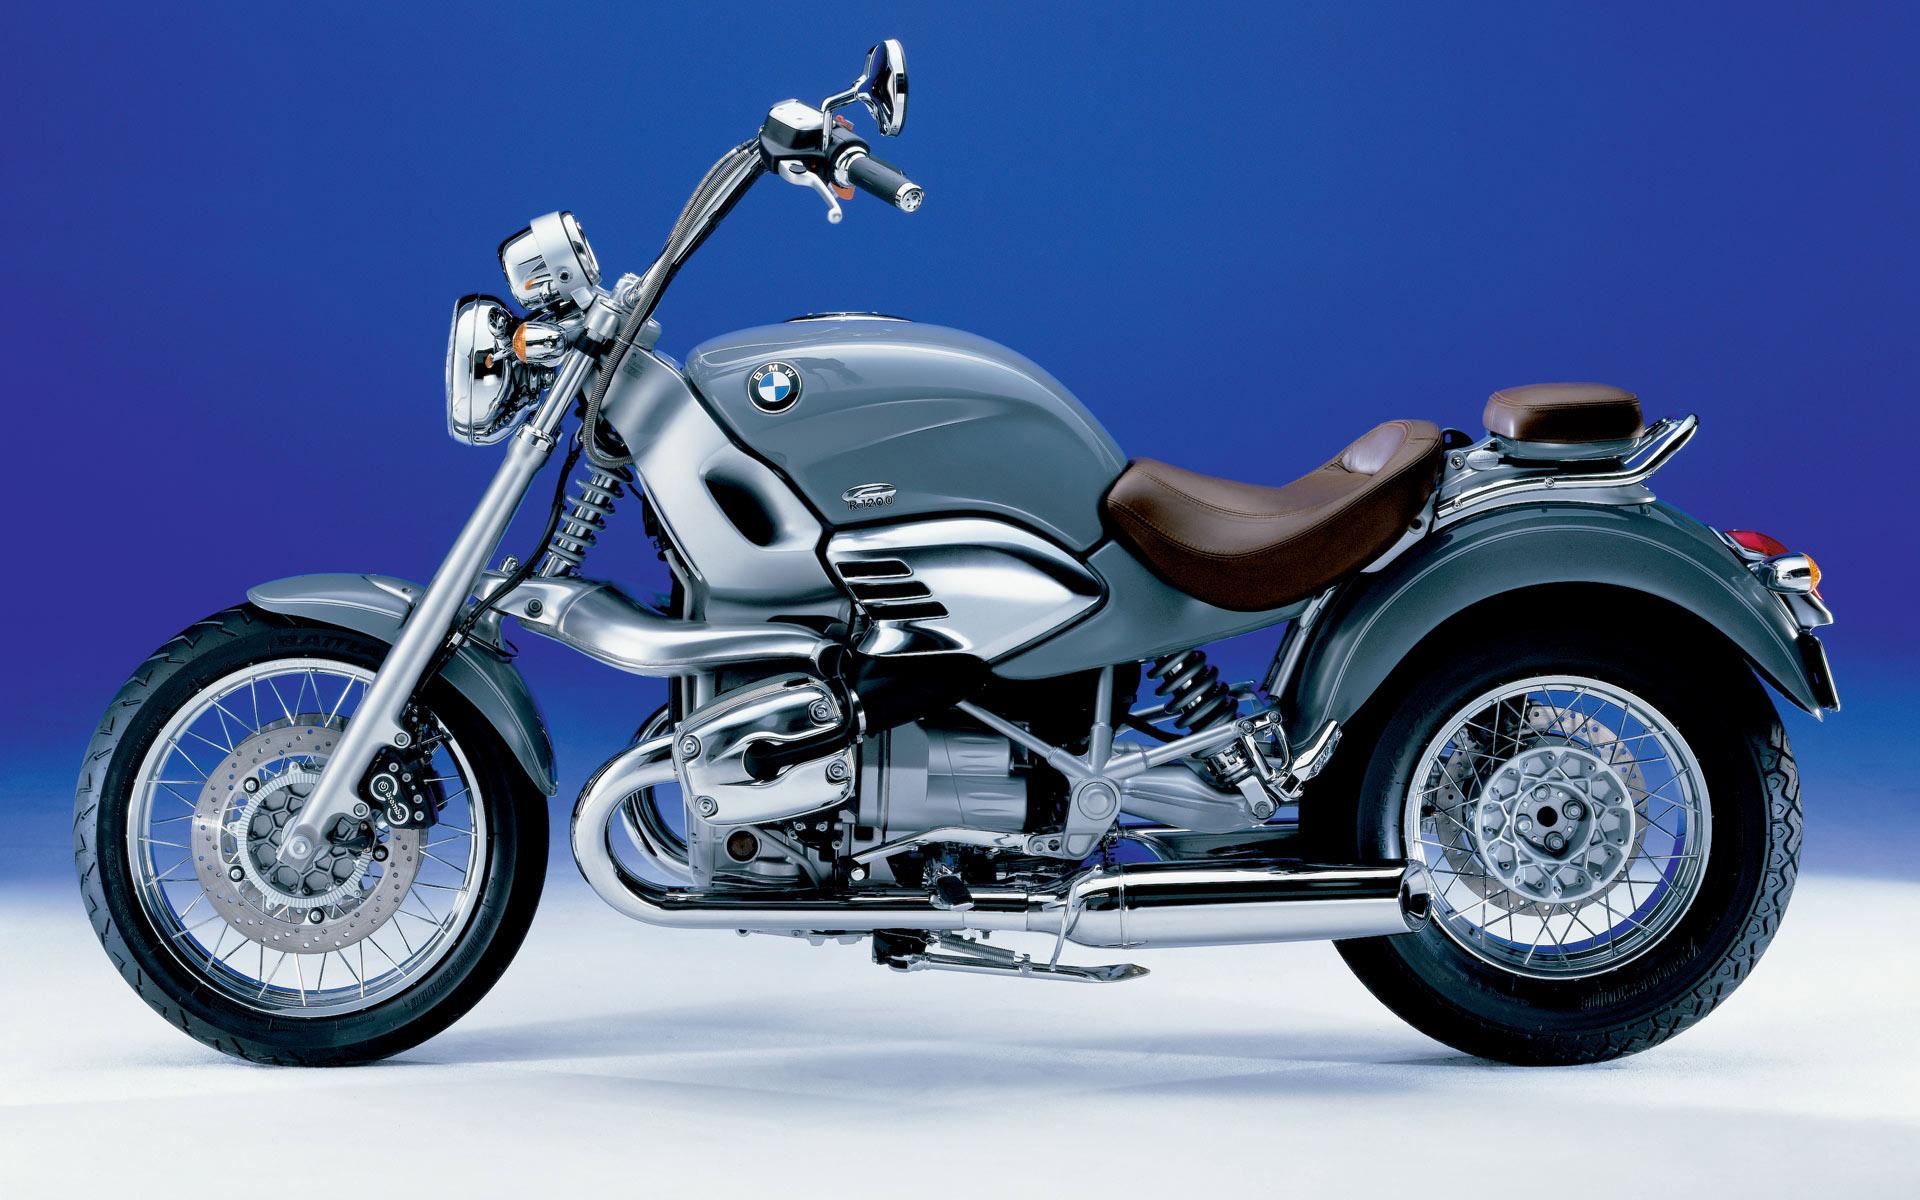 BMW Motorcycle desktop wallpaper pictures Classics   BMW Motorcycle 1920x1200